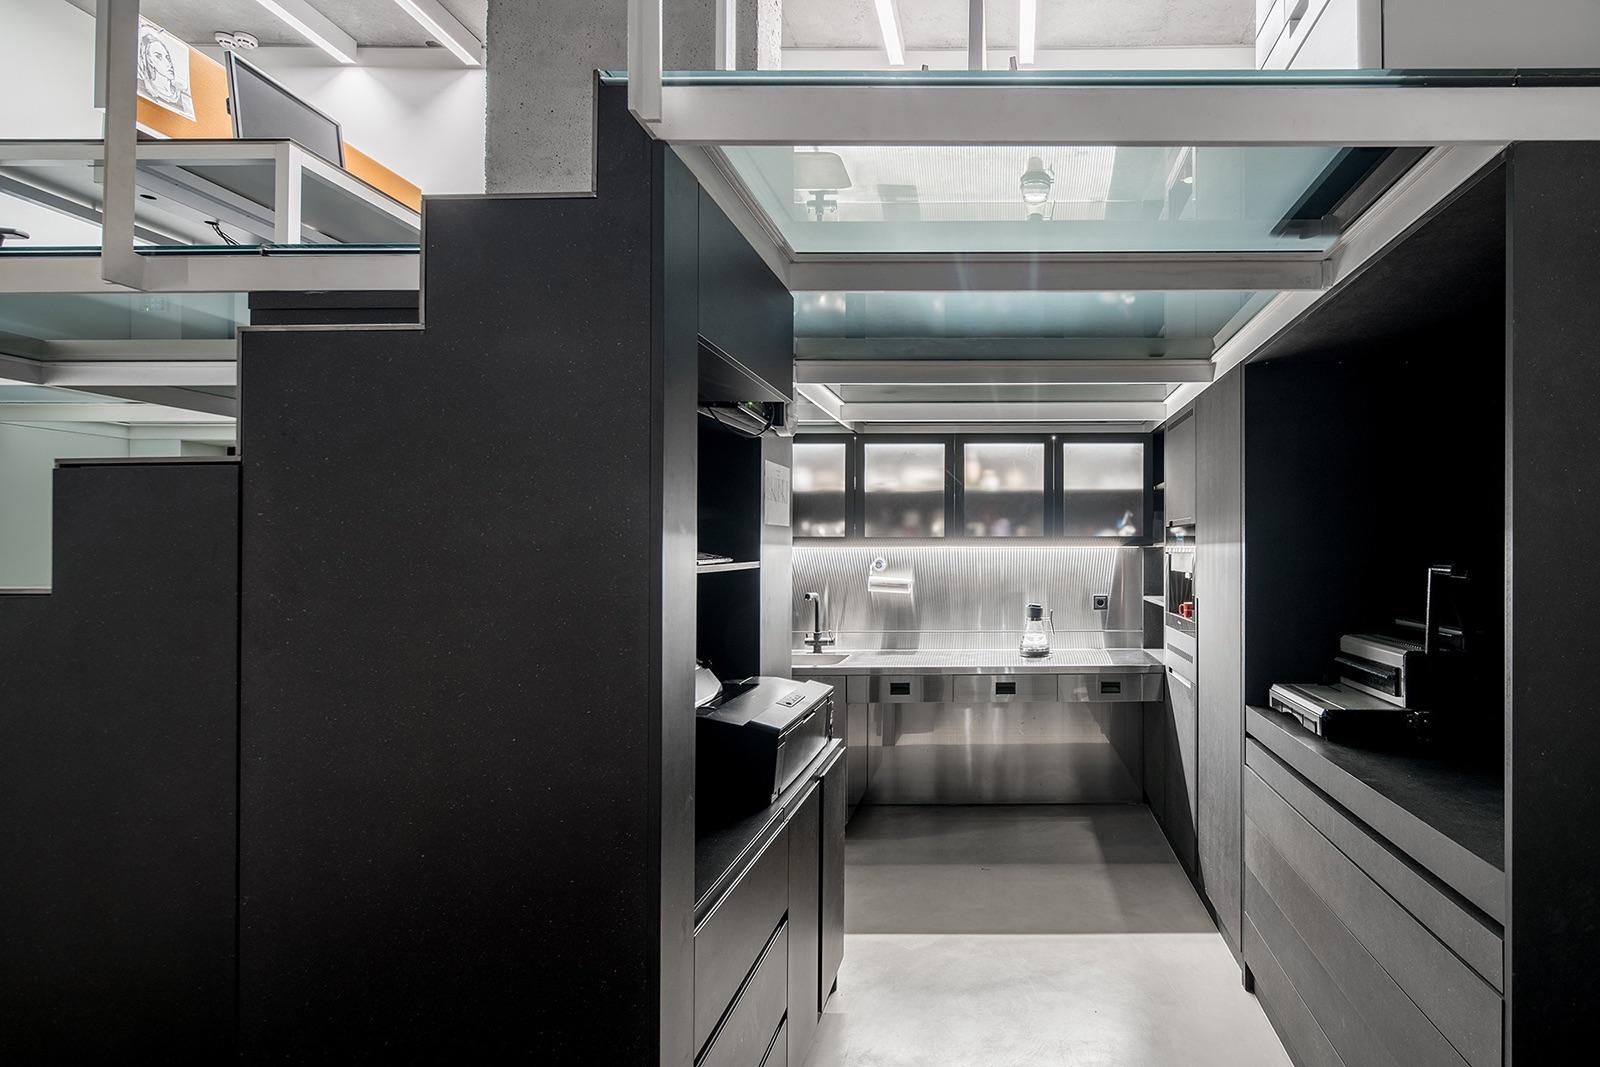 yod-design-lab-office-14